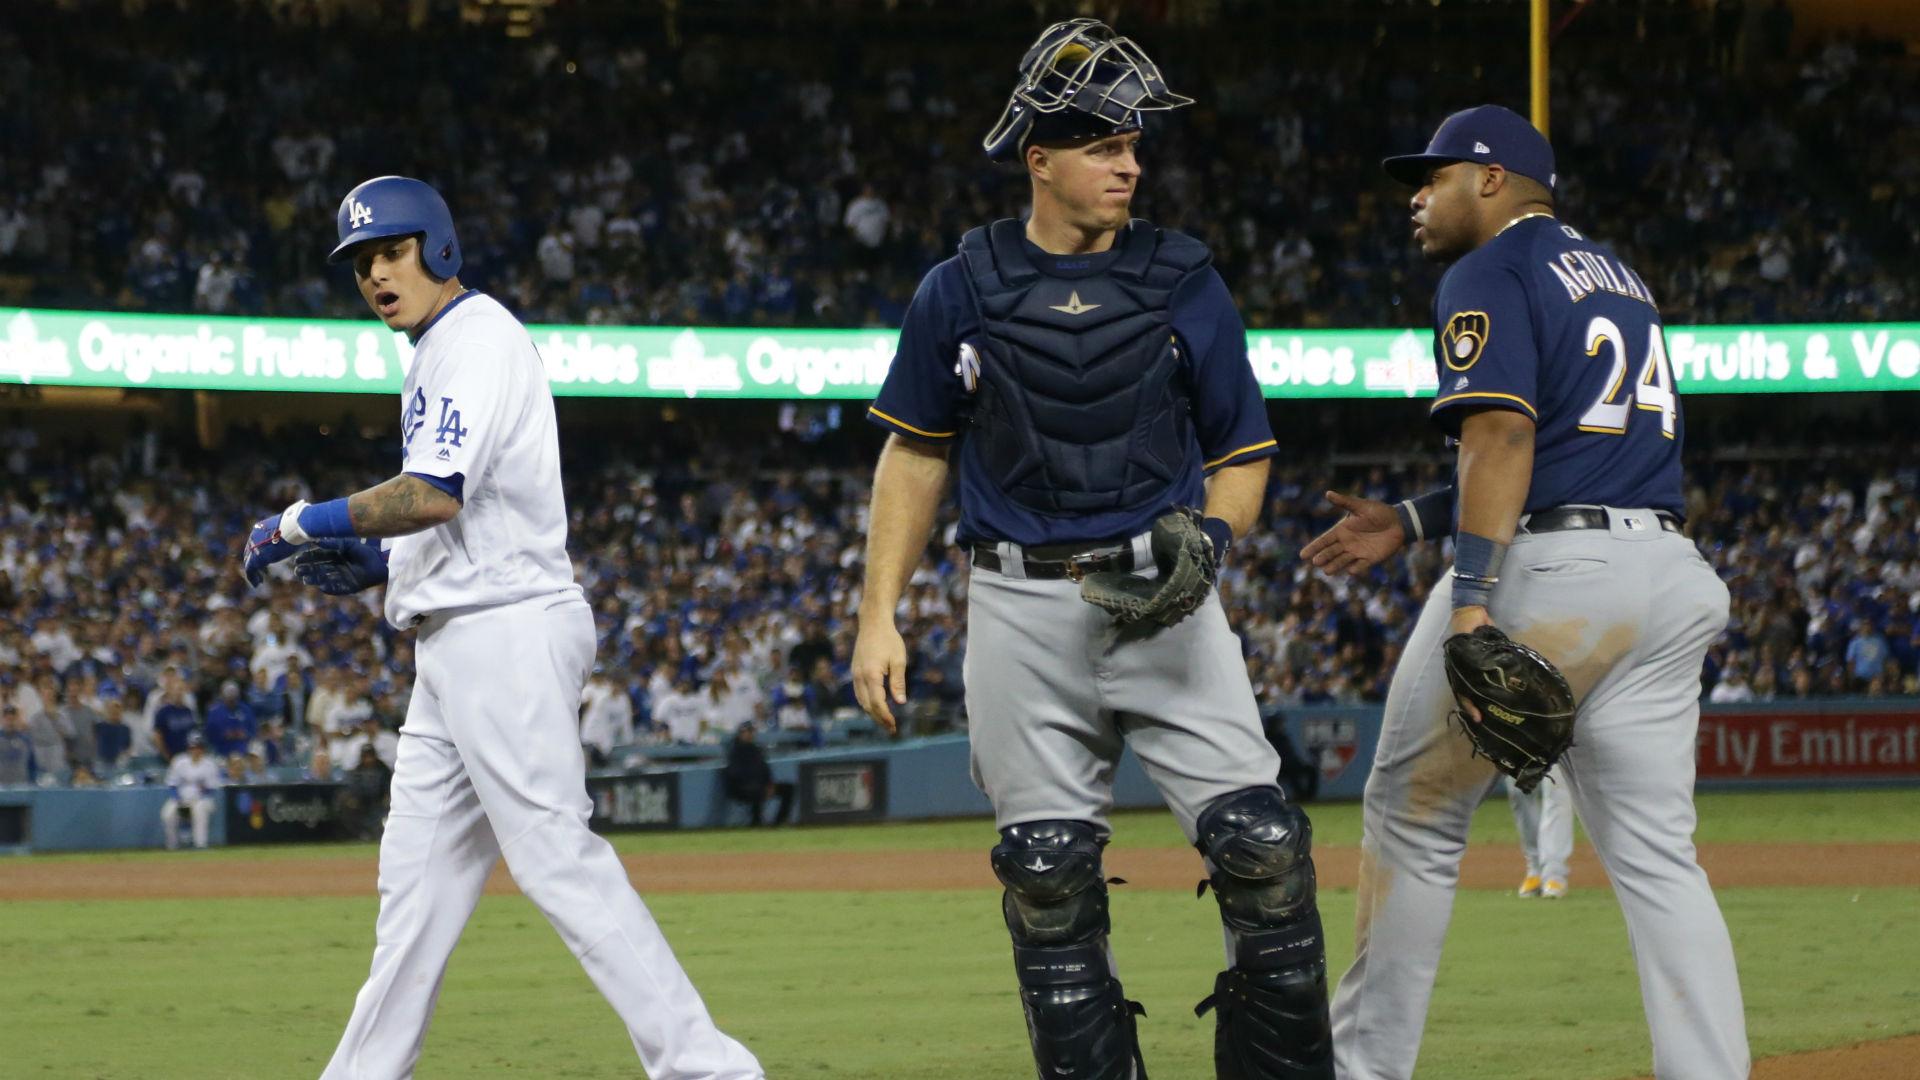 MLB postseason 2018: Manny Machado fined $10K after running into Jesus Aguilar, report says